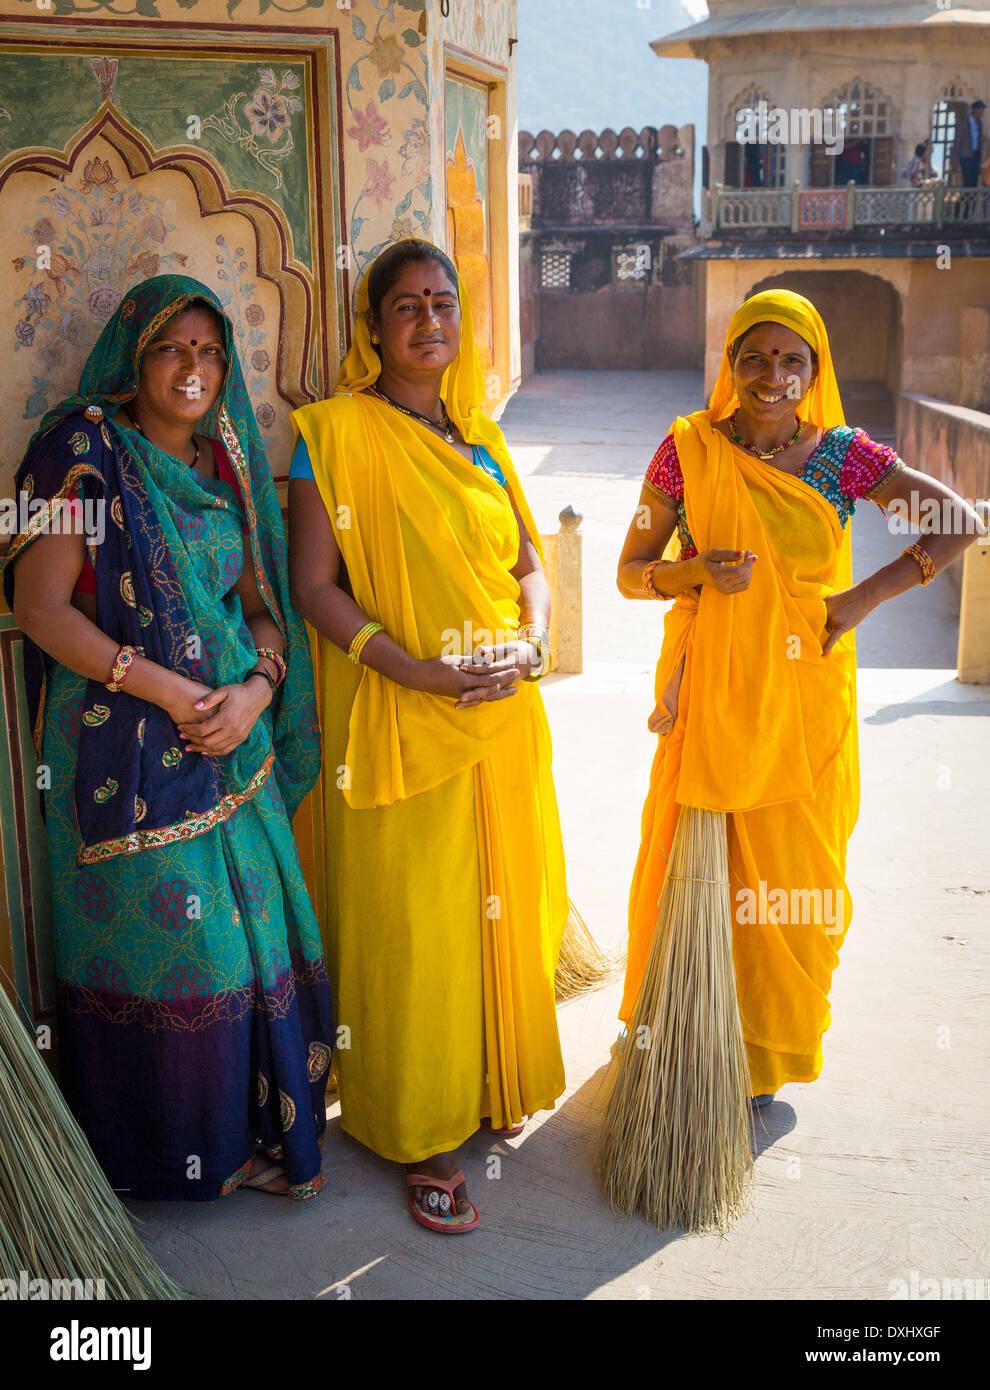 Las mujeres indias en Fuerte Amer, Rajasthan, India Imagen De Stock